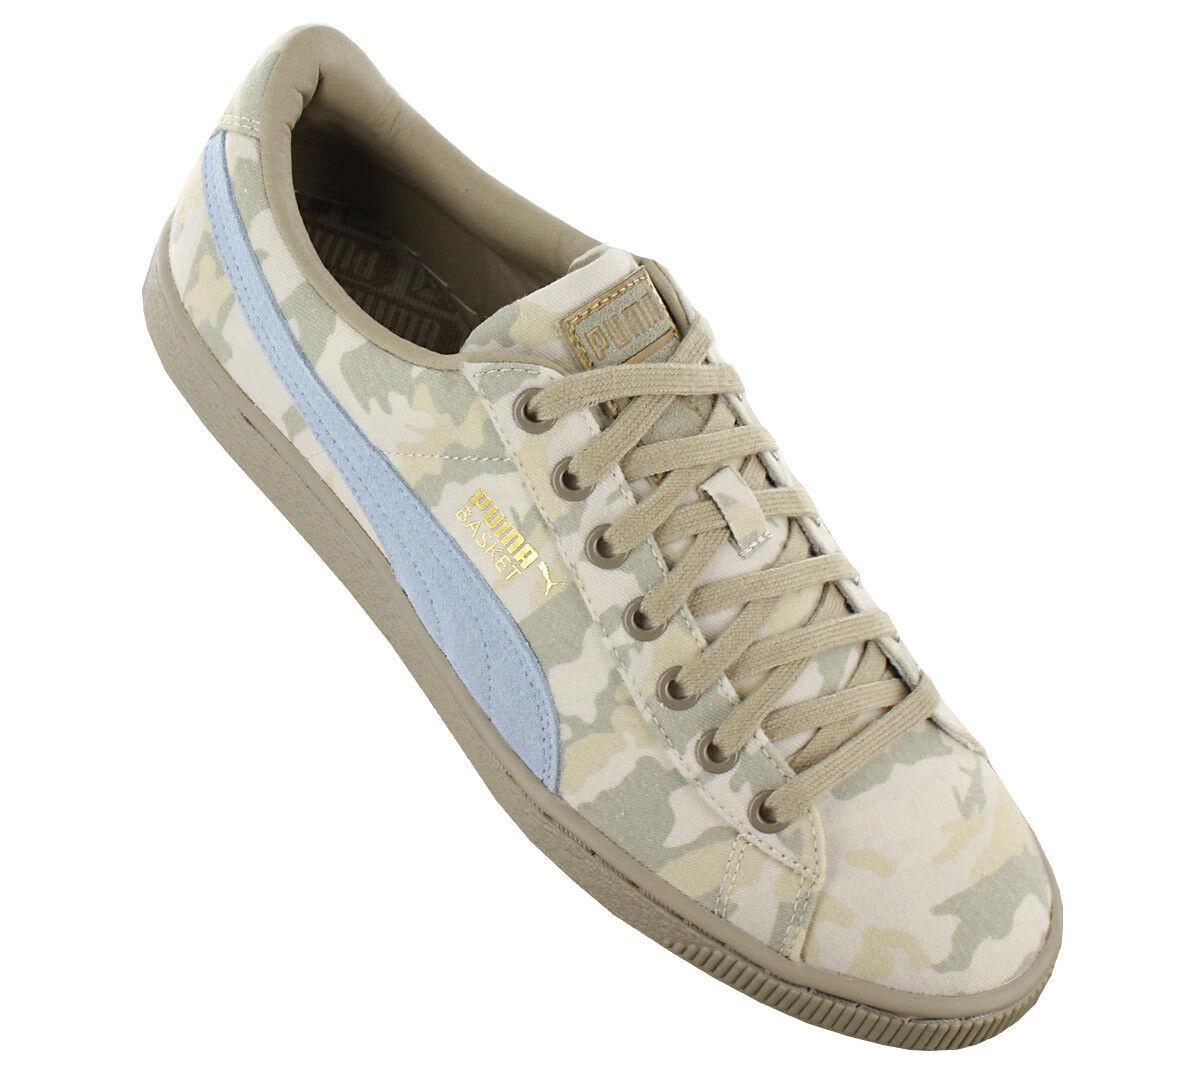 NEW Puma Basket Classic Camo 364191-02 Men''s shoes Trainers Sneakers SALE